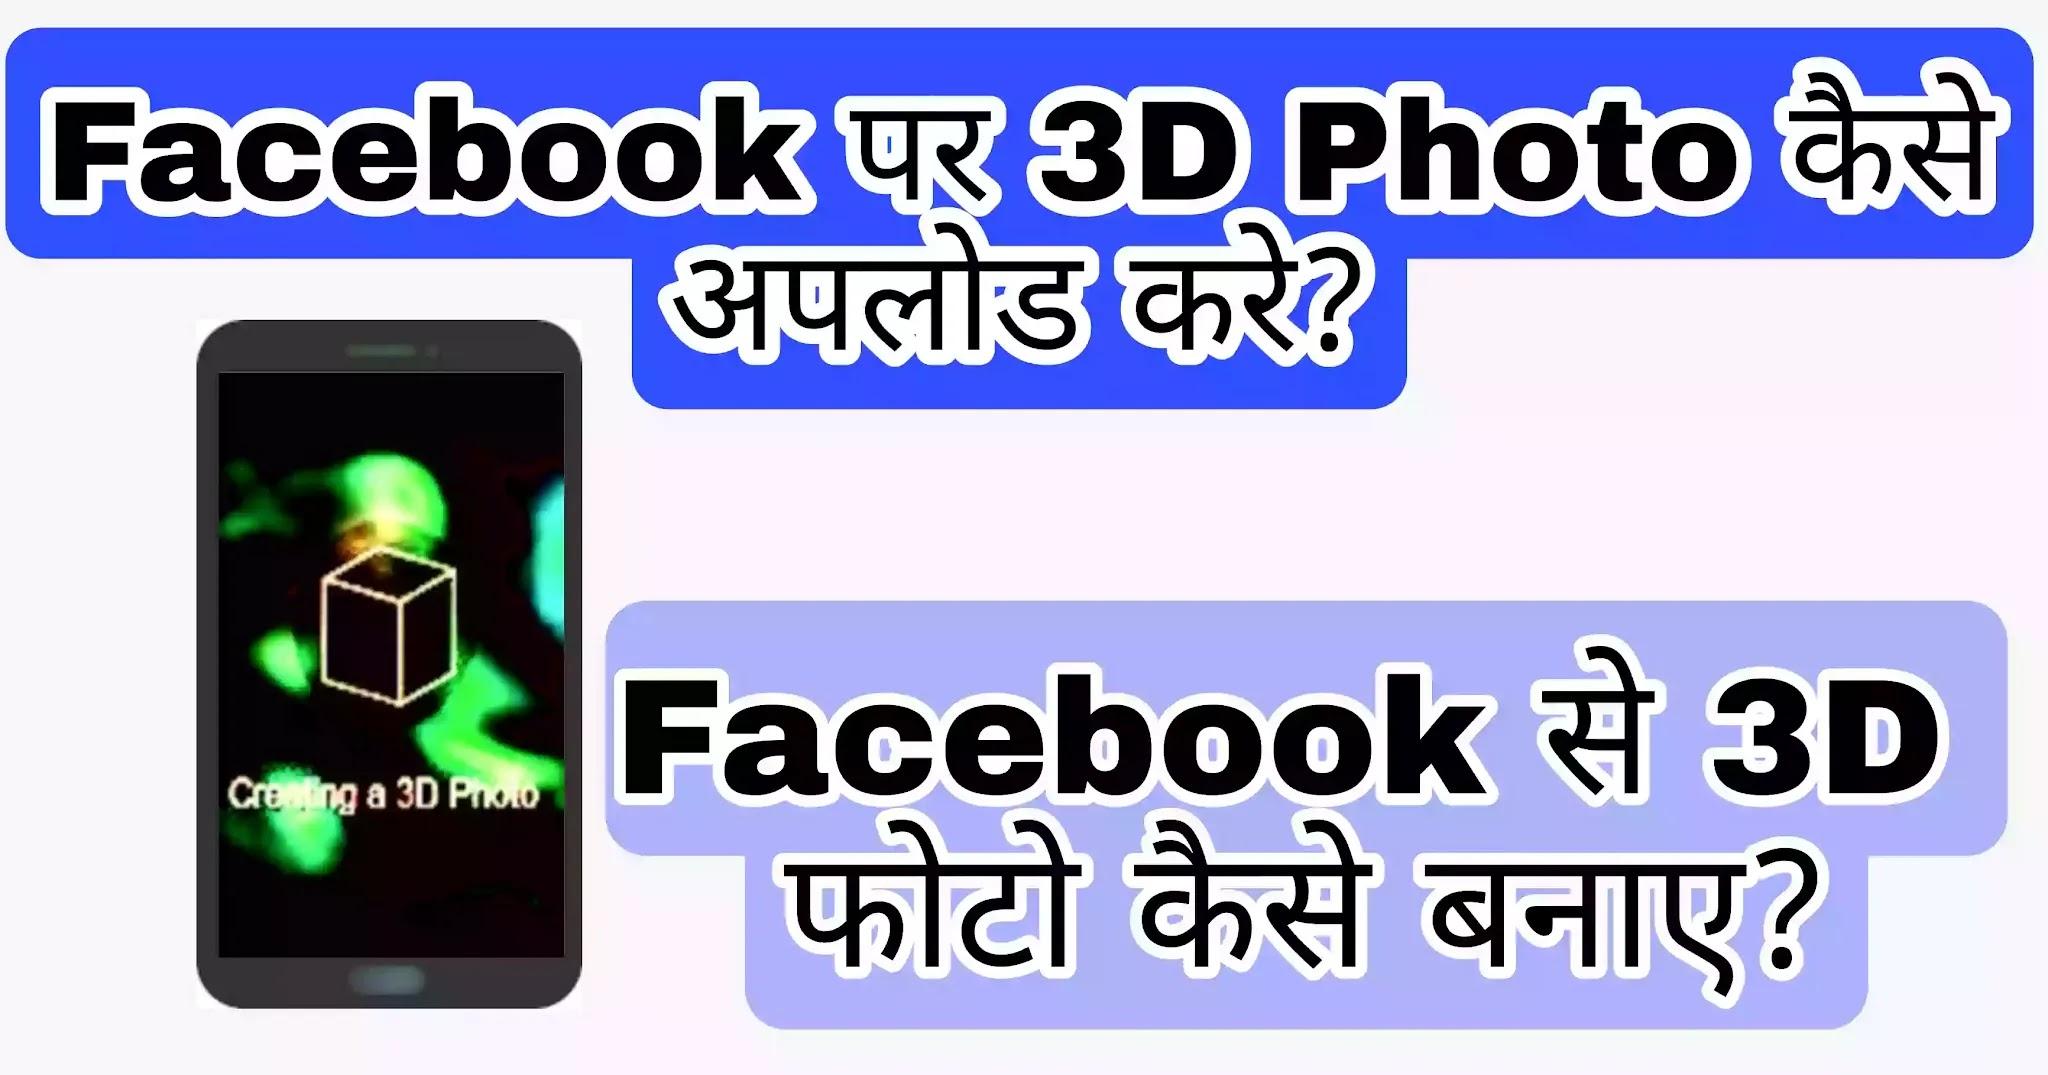 Facebook-par-3D-photo-upload